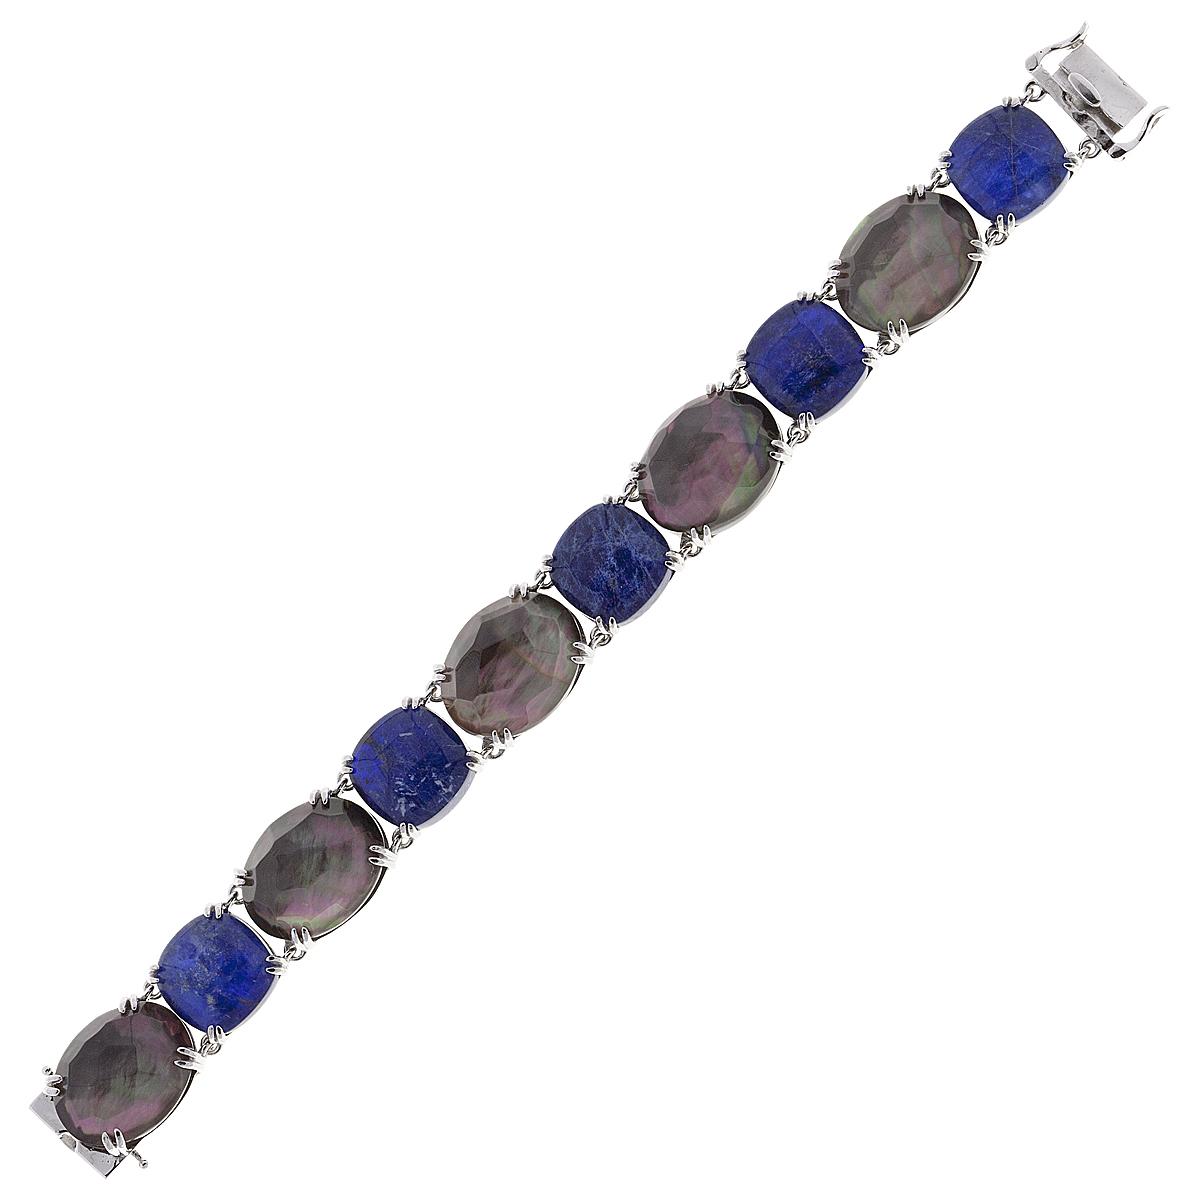 Браслет женский Balex Jewellery 7430930096 из серебра, содалит/перламутр, р. 18